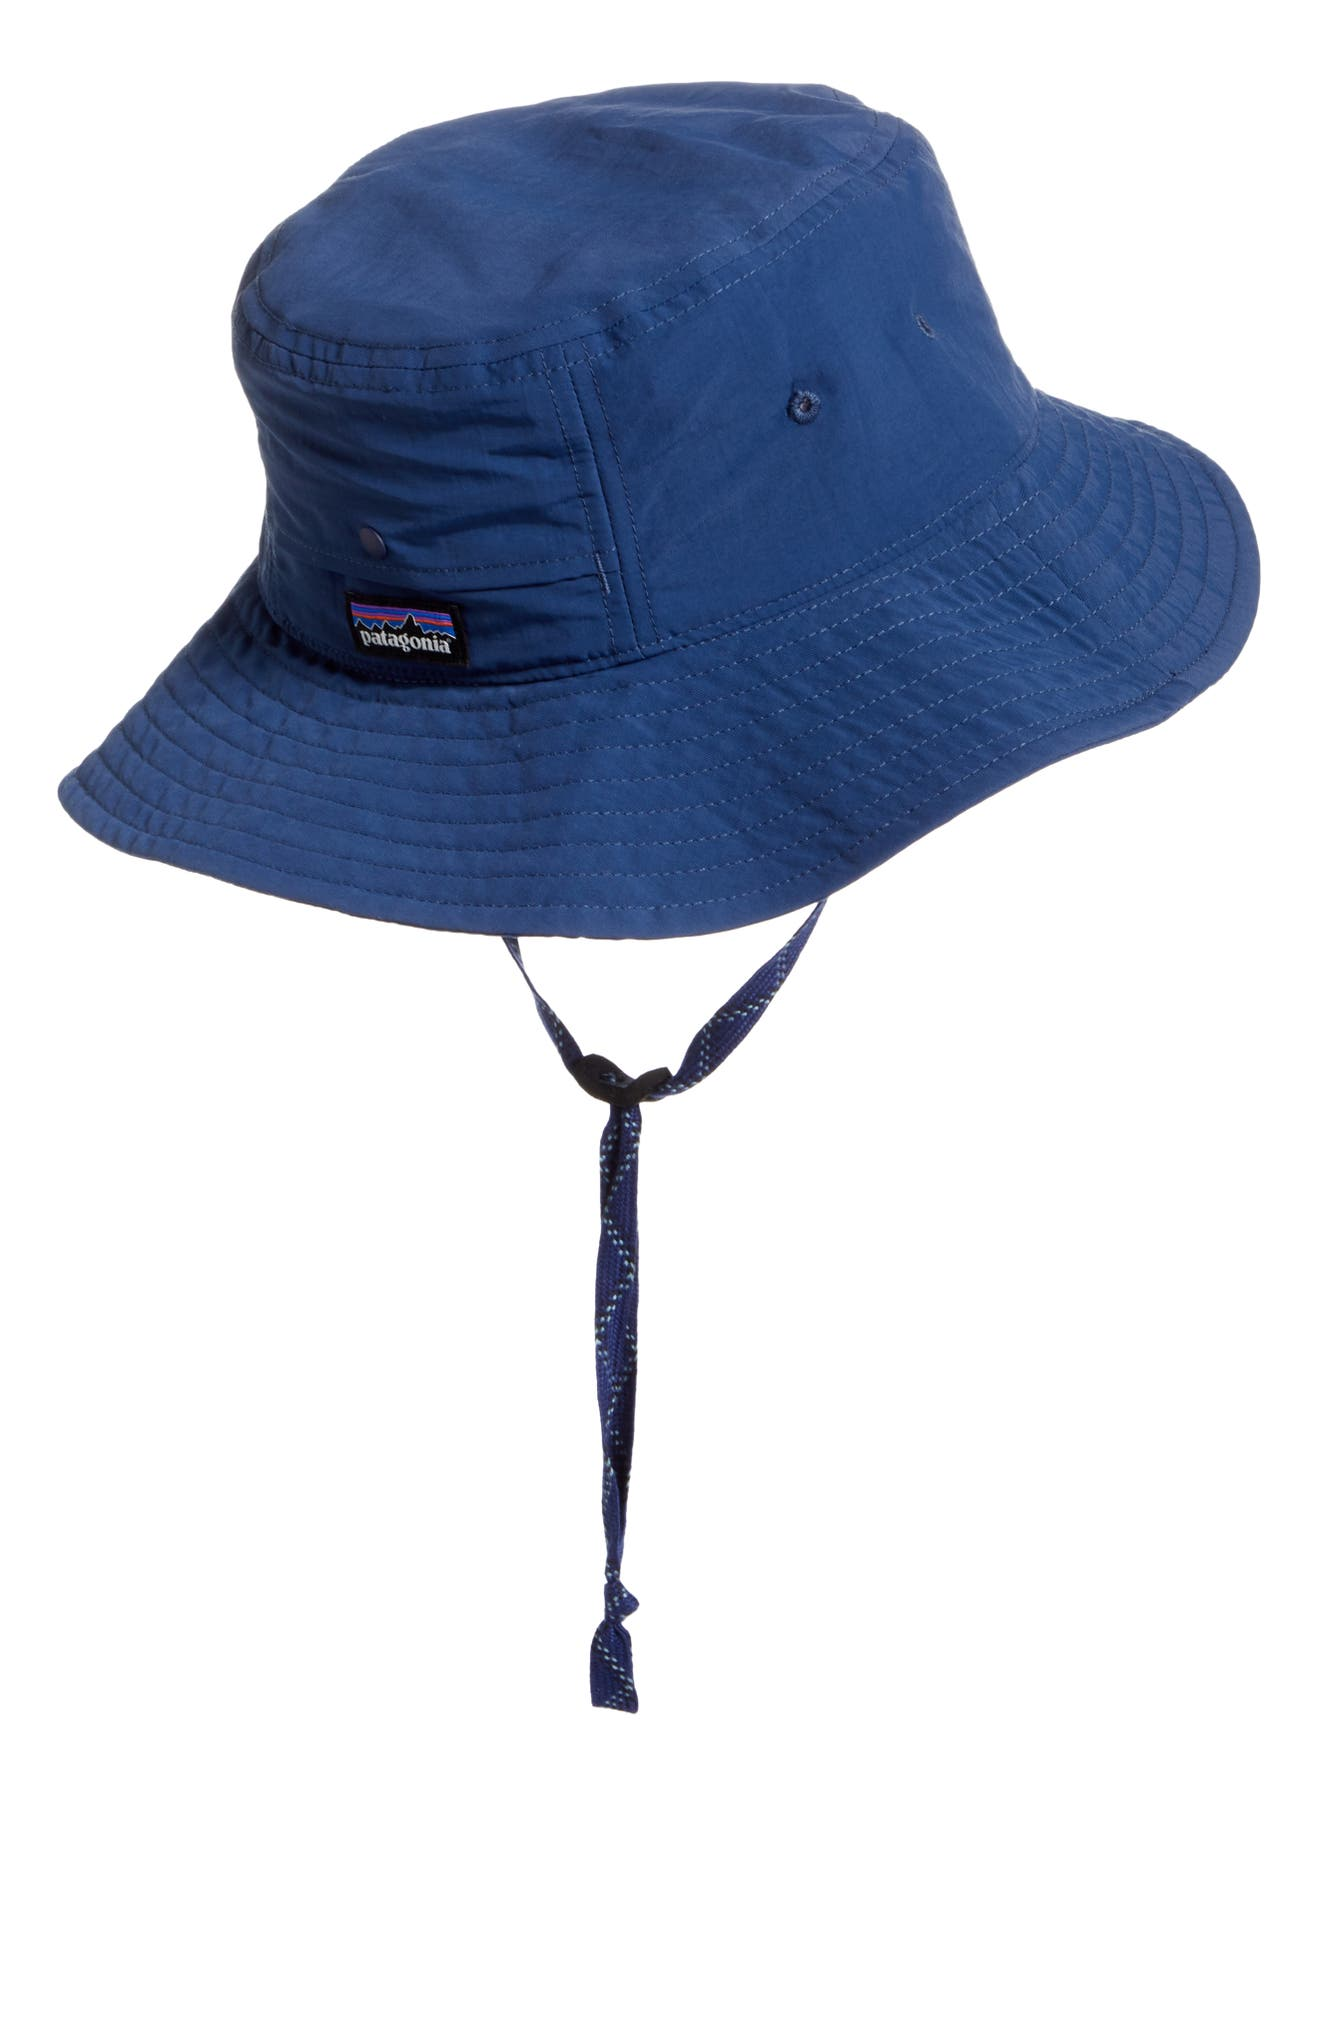 f5c6bce1 Patagonia Mickledore Packable Bucket Hat | Nordstrom